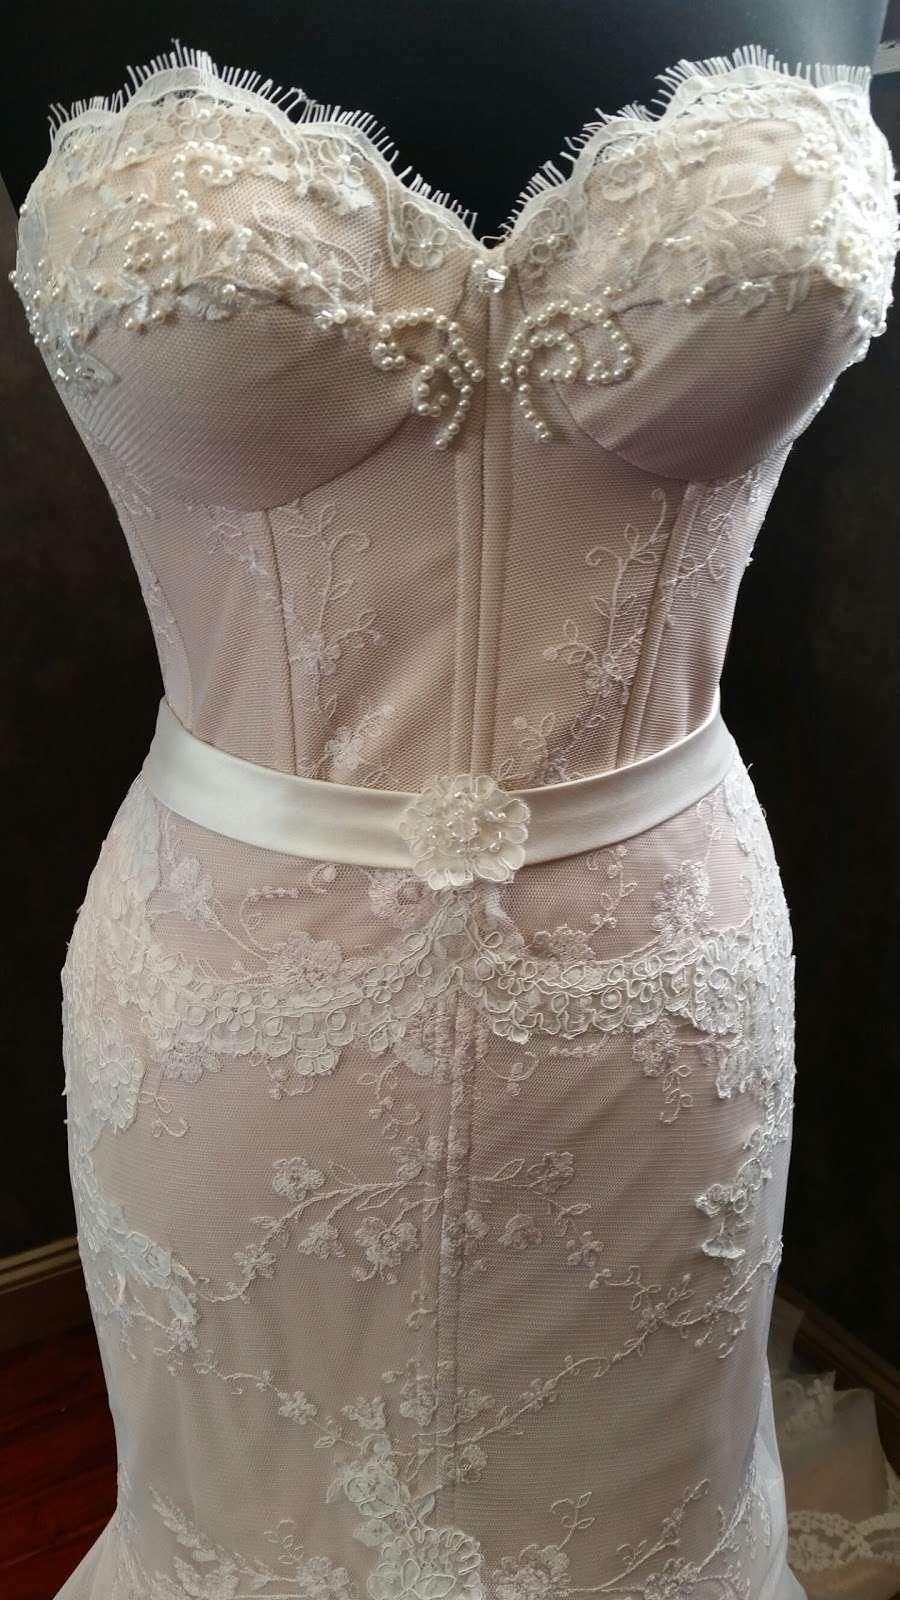 Couture de Bride - clothing store    Photo 6 of 10   Address: 406 Cedar Ln, Teaneck, NJ 07666, USA   Phone: (201) 357-4877